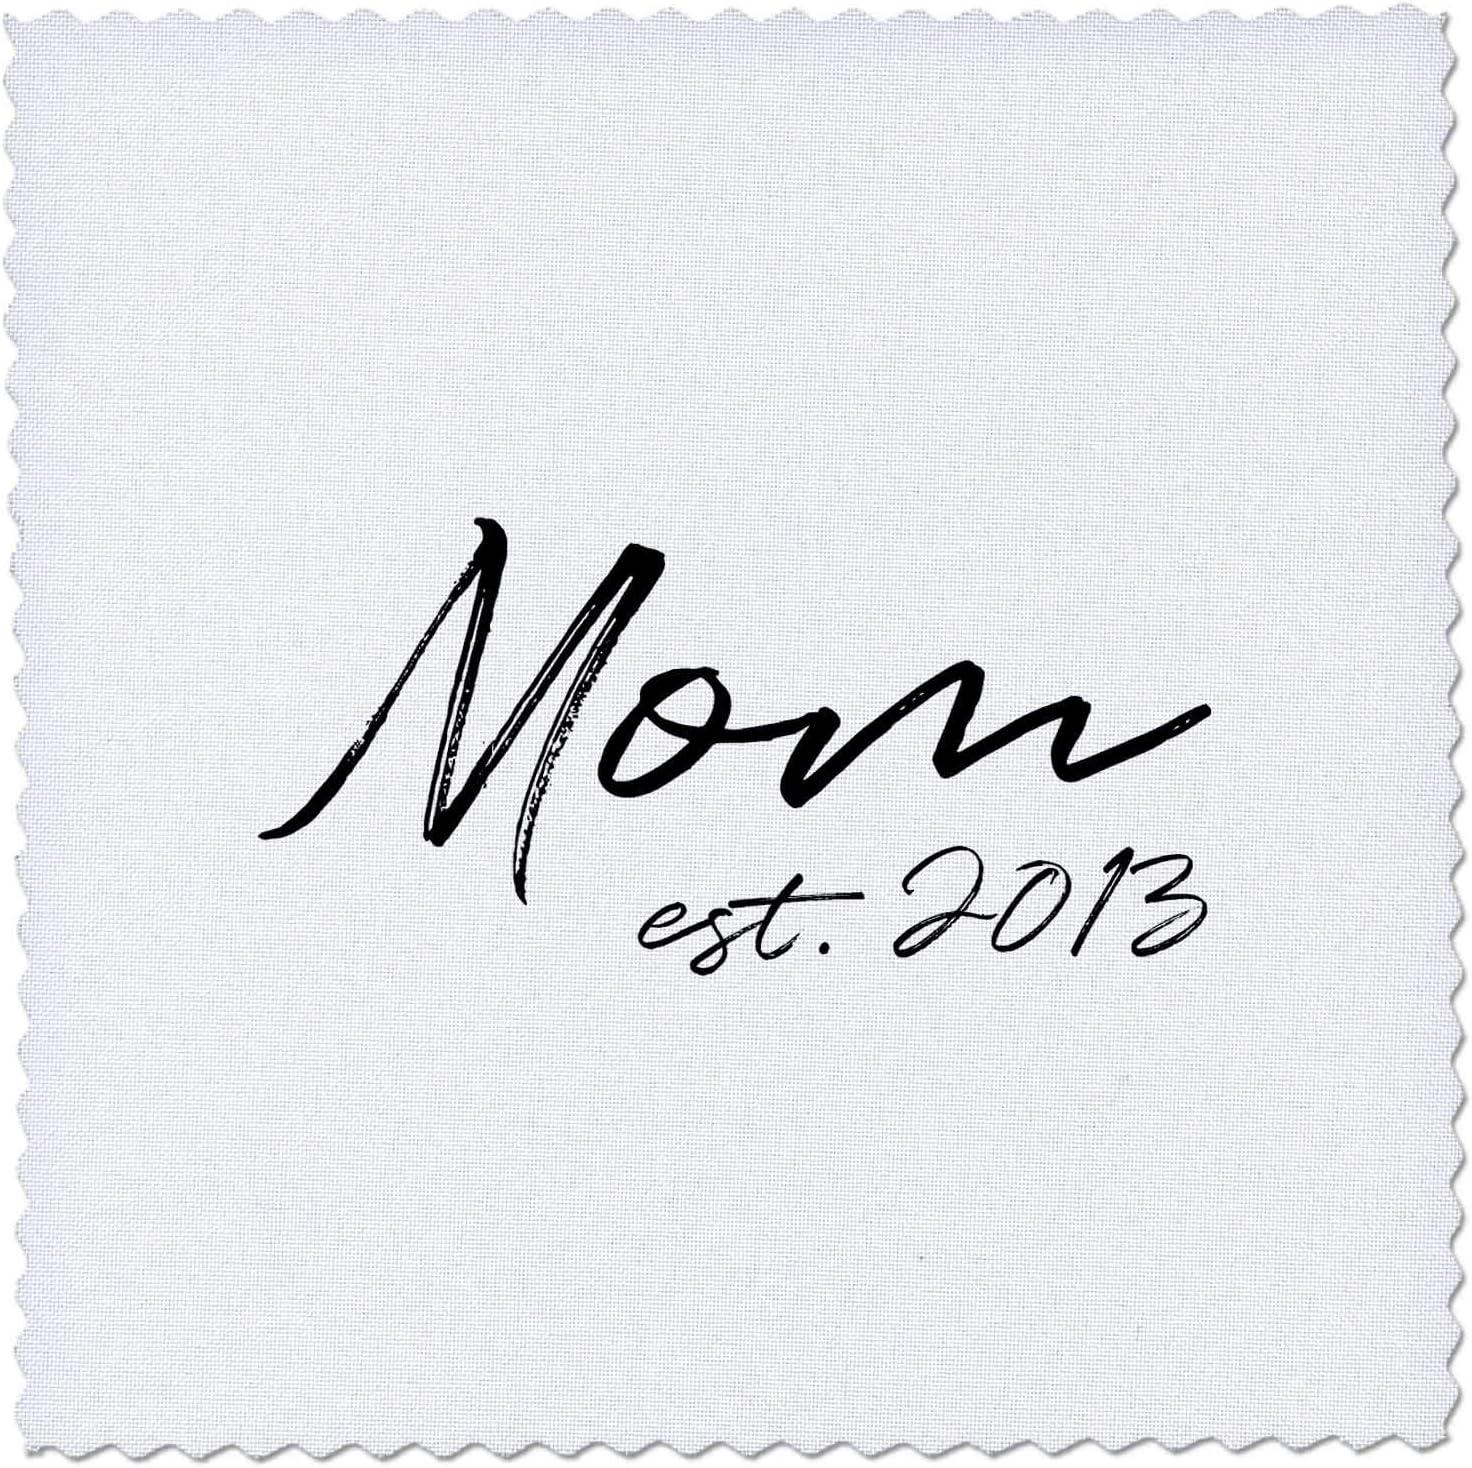 3dRose Bargain Mom Max 88% OFF established 2013. Black on lettering white. felt pen